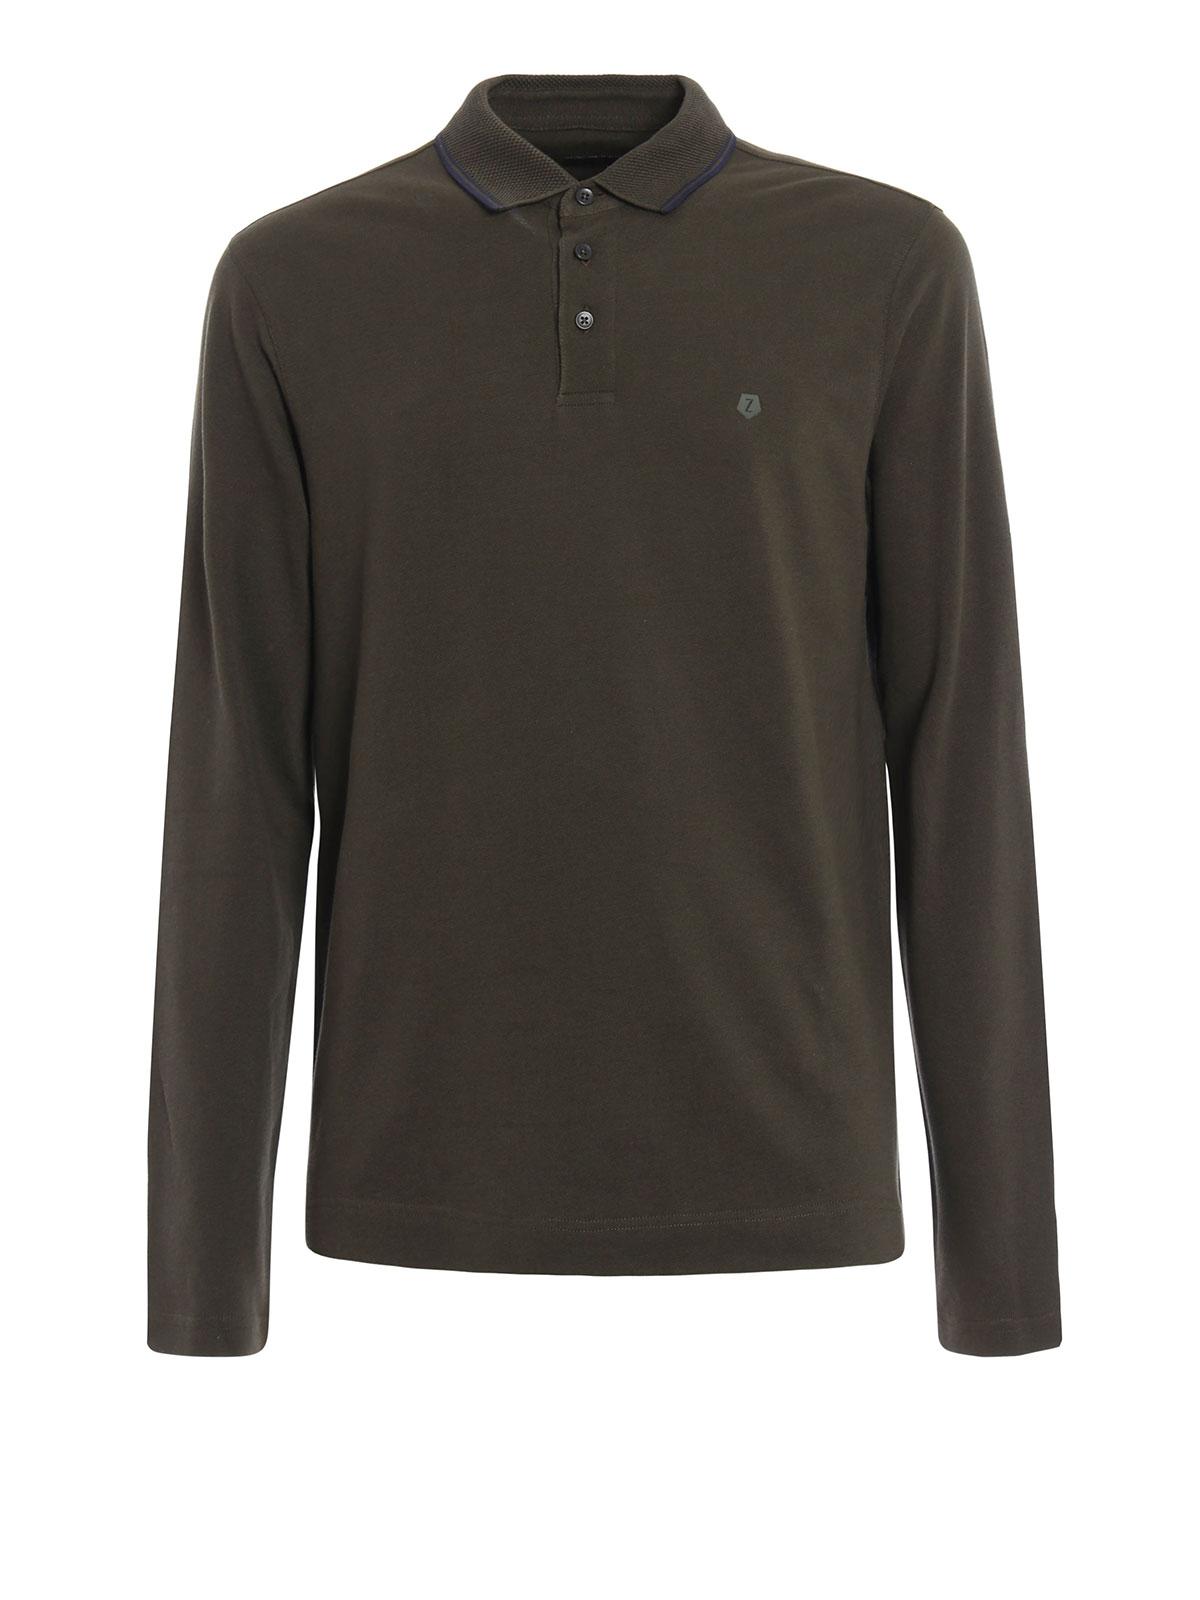 Long sleeves polo shirt by z zegna polo shirts ikrix for Zegna polo shirts sale